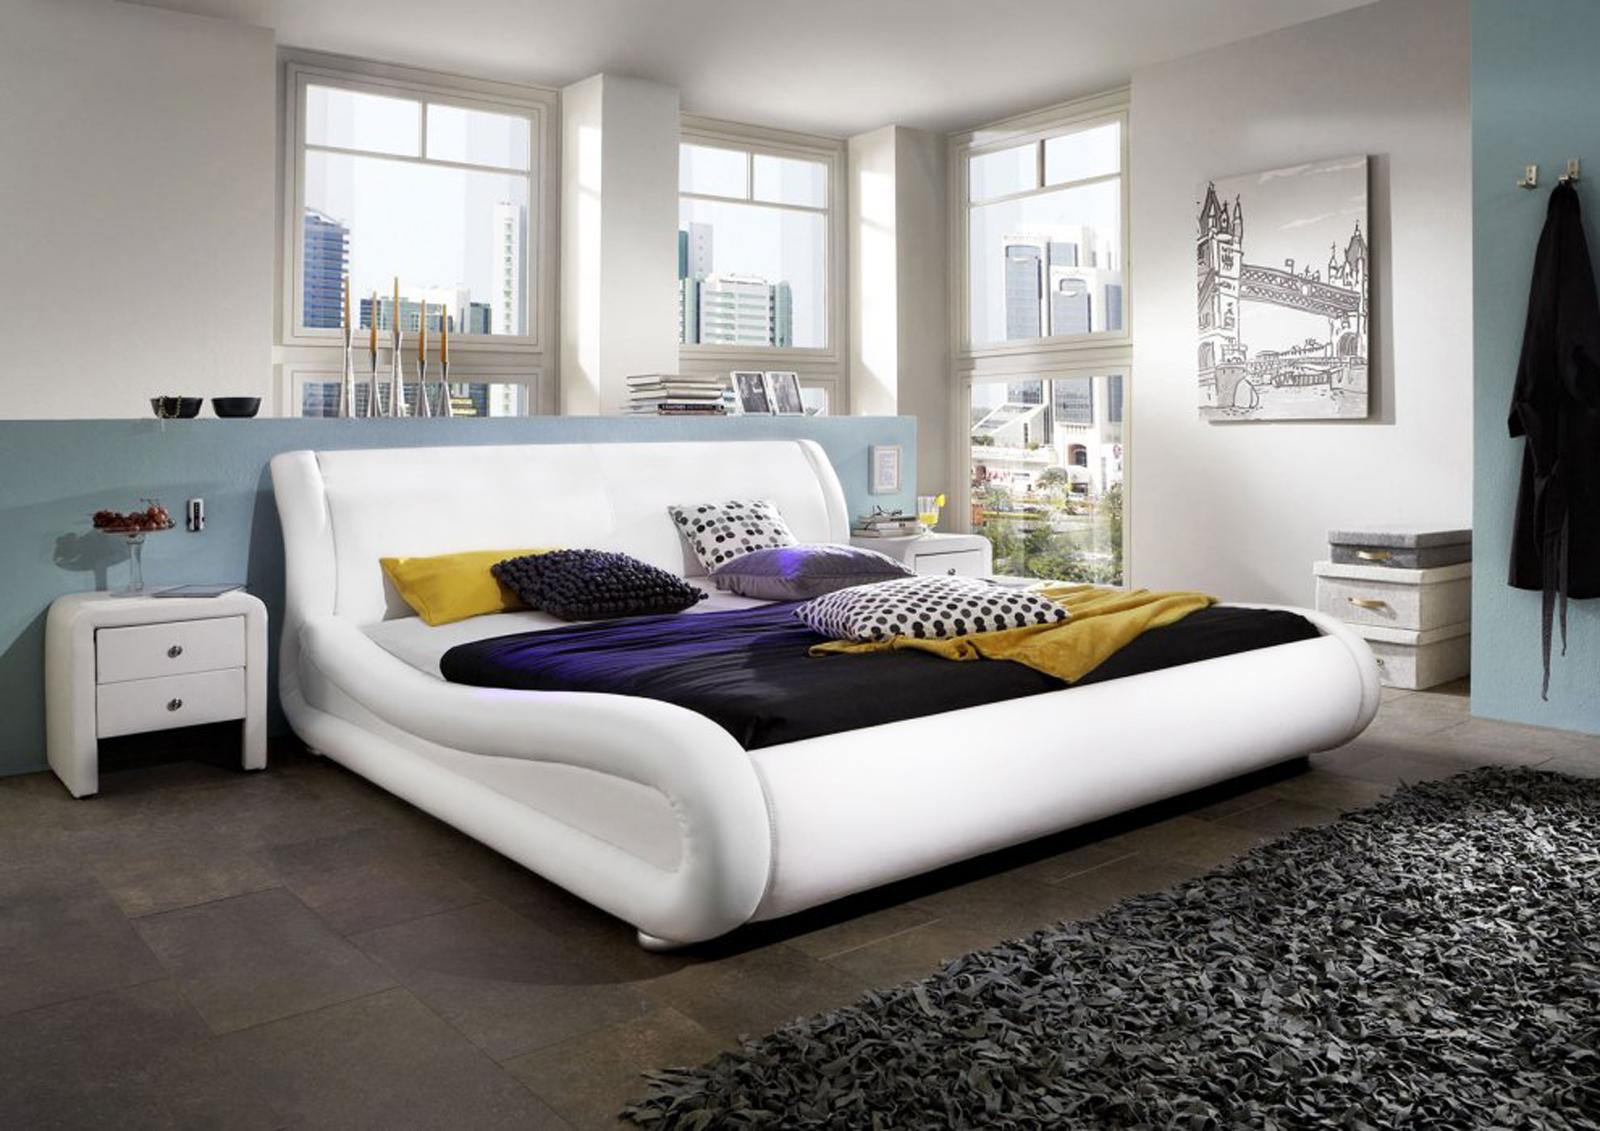 sale polsterbett bettgestell 140 x 200 cm wei clip. Black Bedroom Furniture Sets. Home Design Ideas